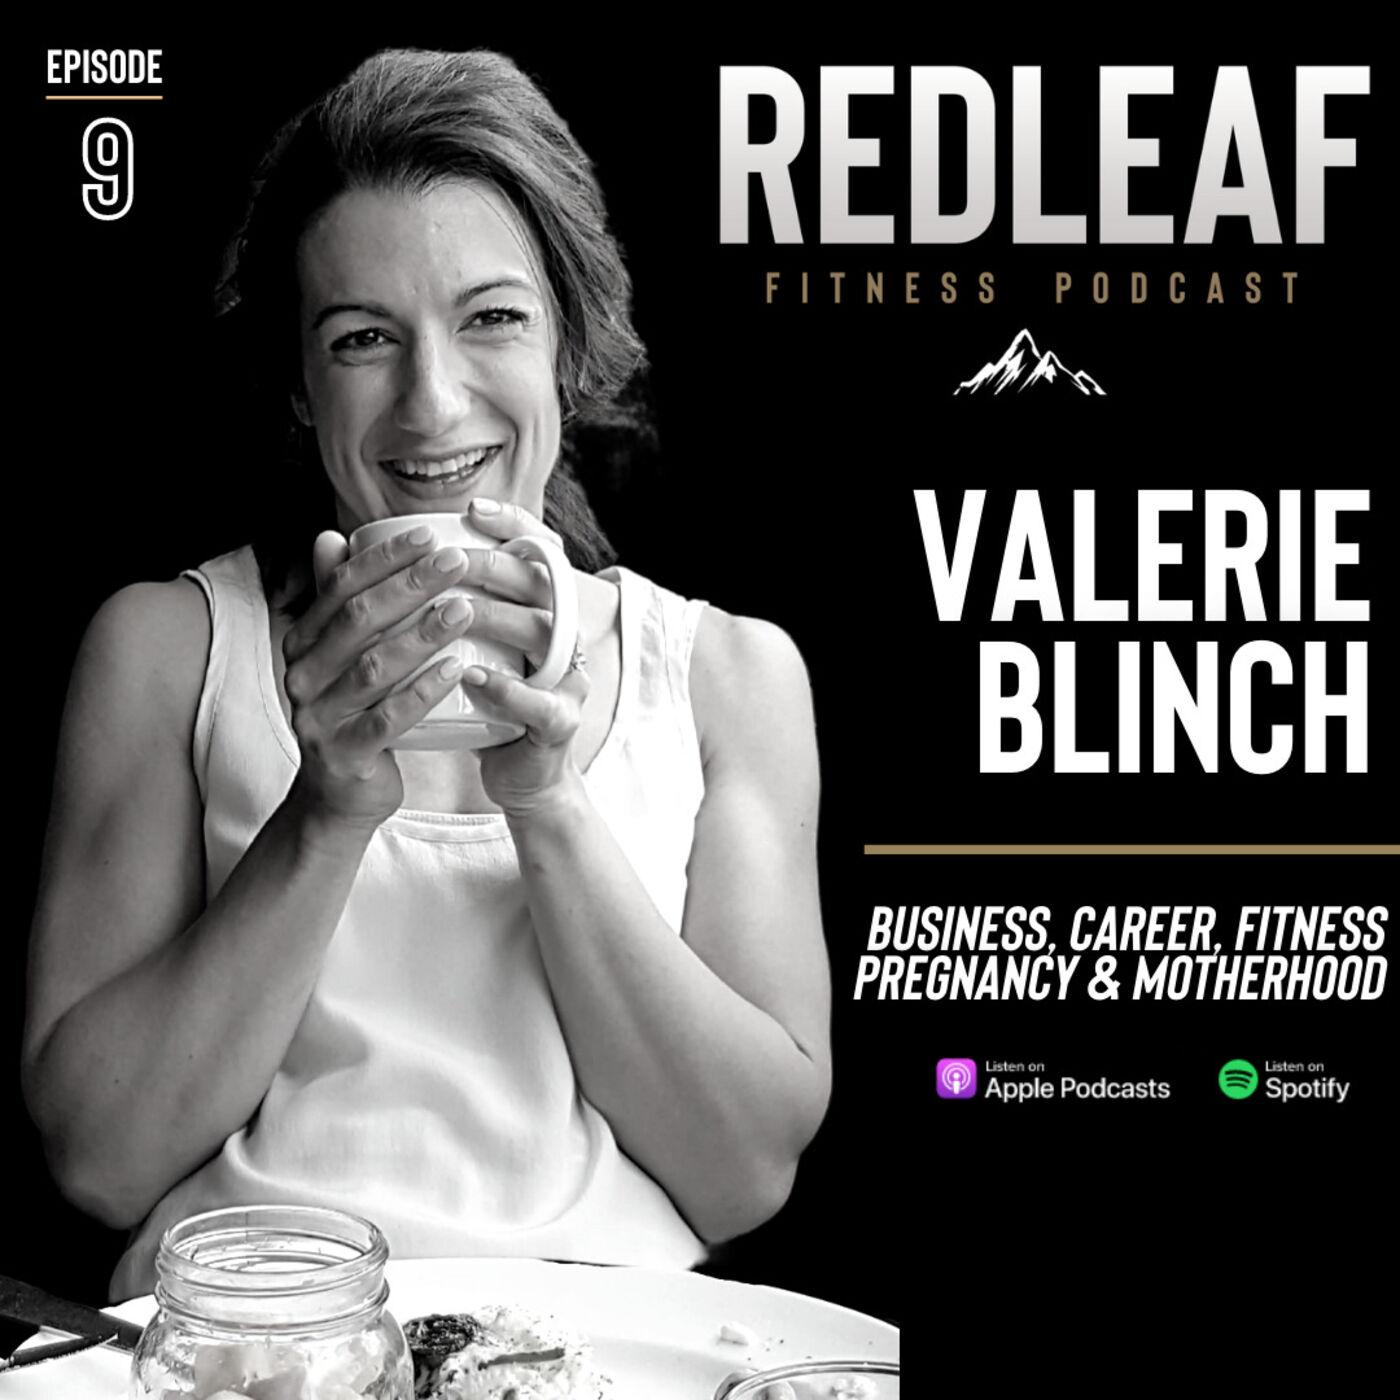 Ep.9   Valerie Blinch - Business, Career, Nutrition, Fitness, Pregnancy & Motherhood